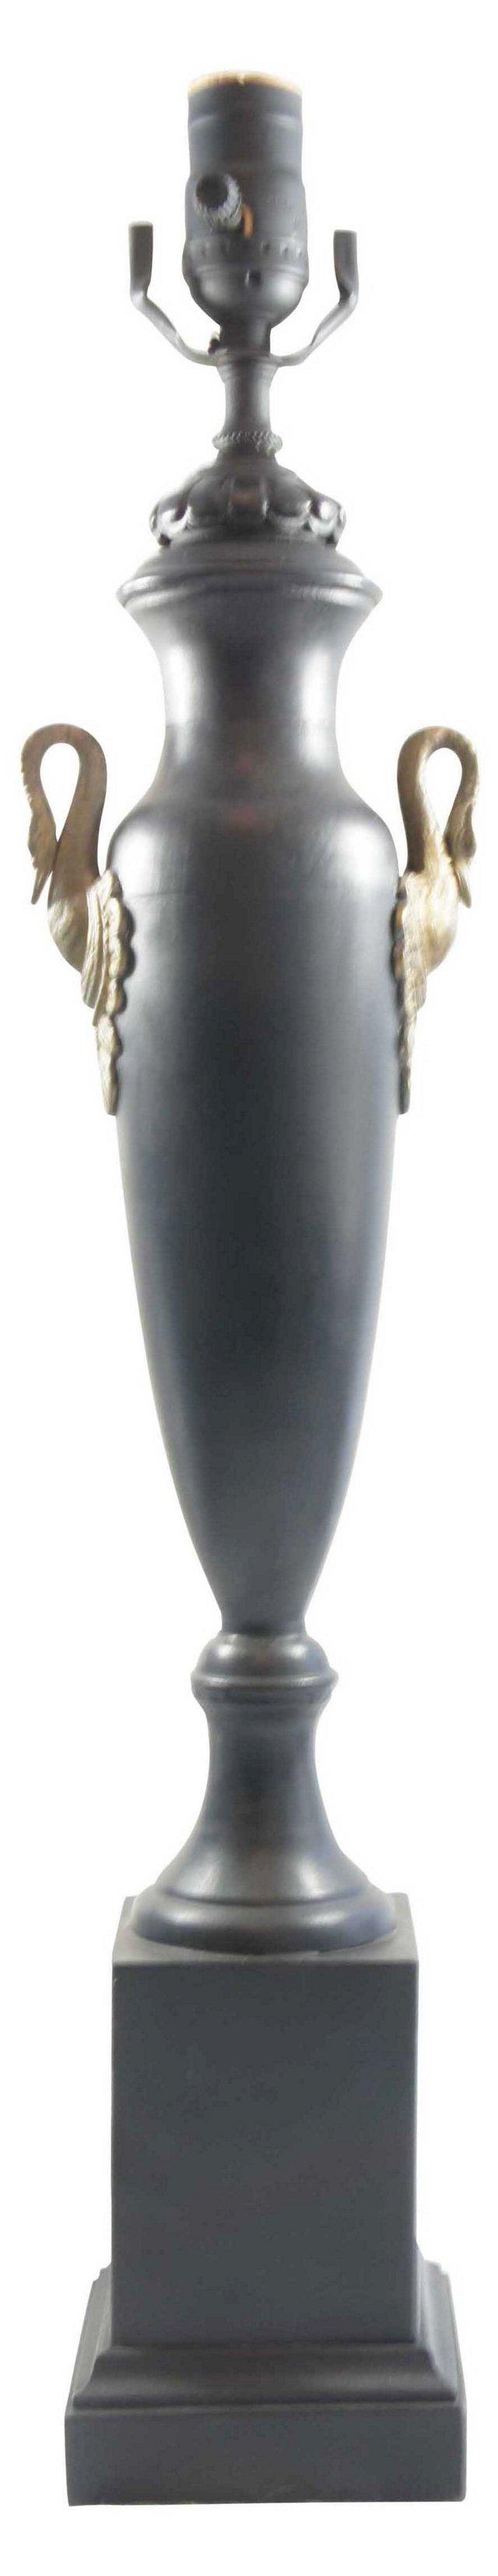 Goose-Handled Lamp